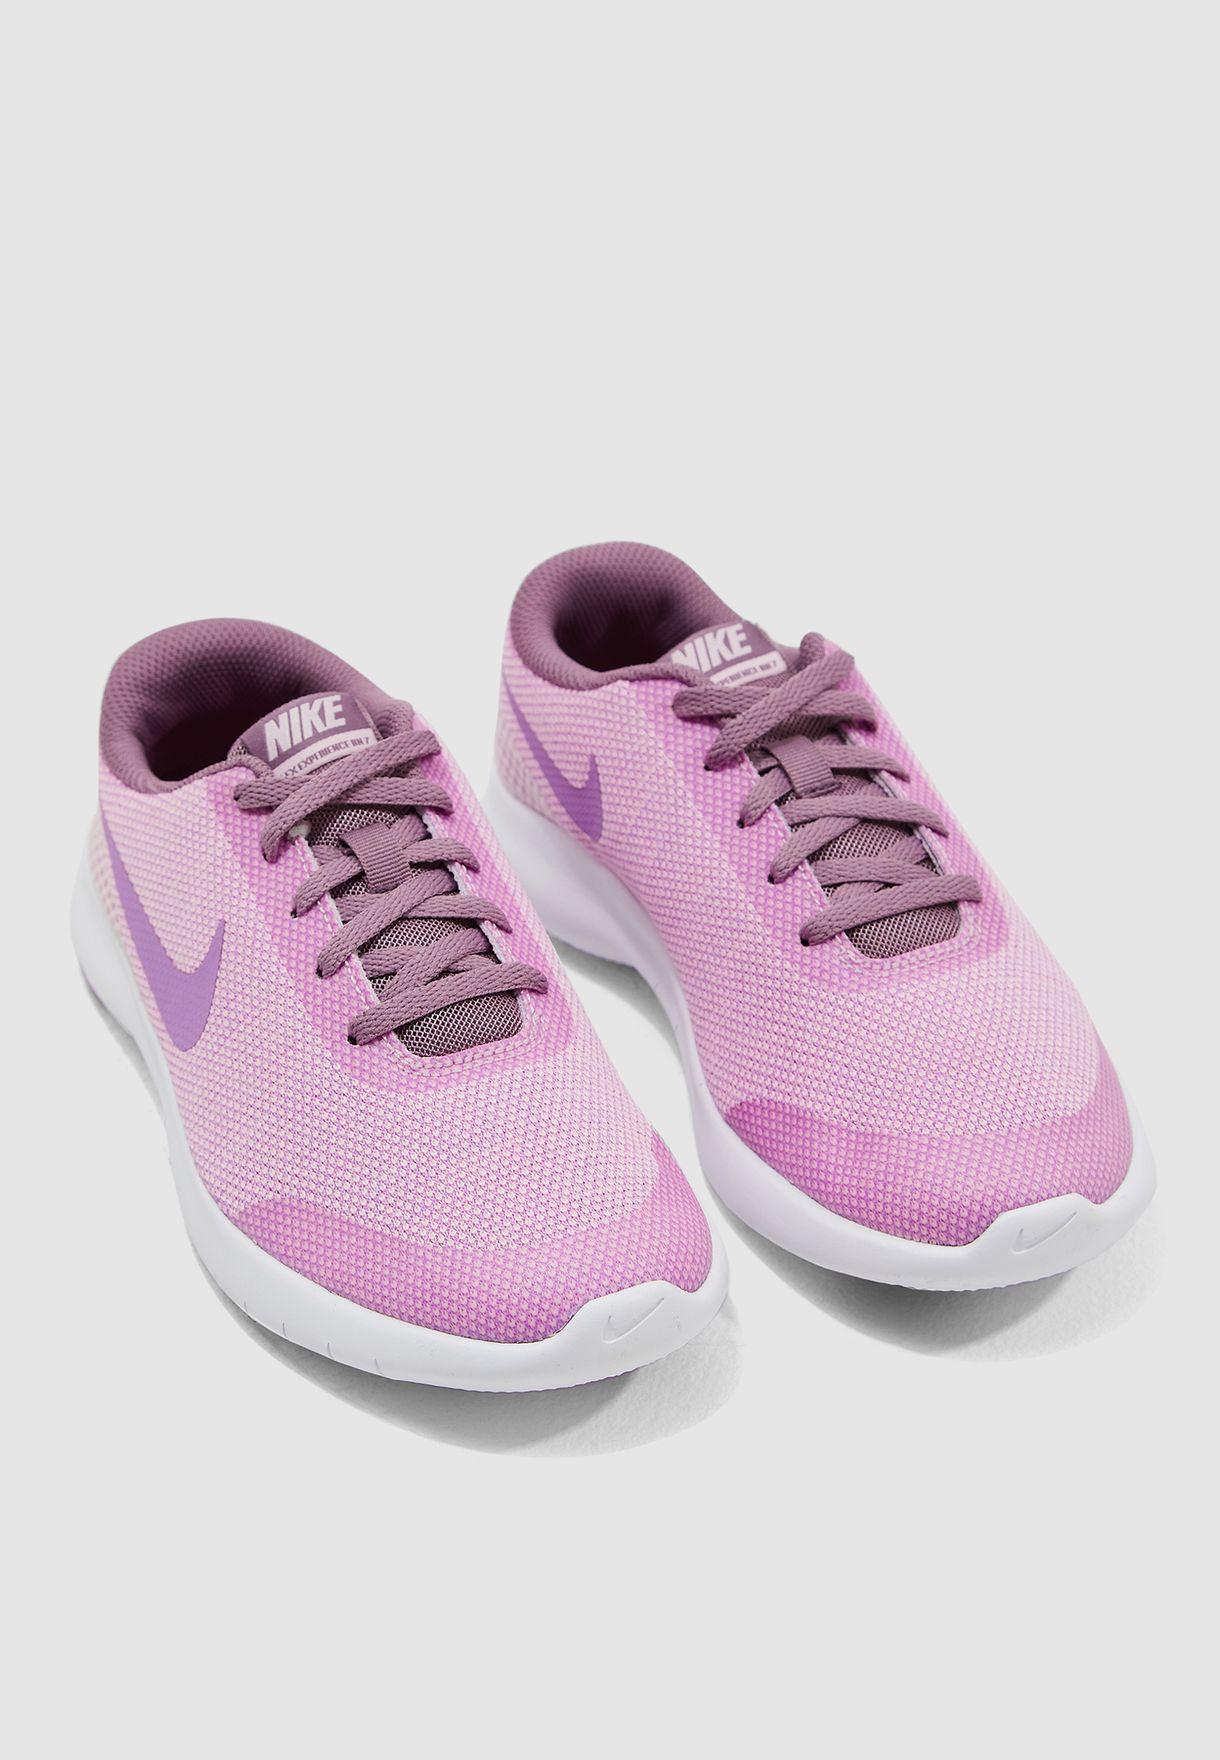 5a6822ec80f5 Shop Nike purple Youth Flex Experience RN 7 943287-602 for Kids in ...